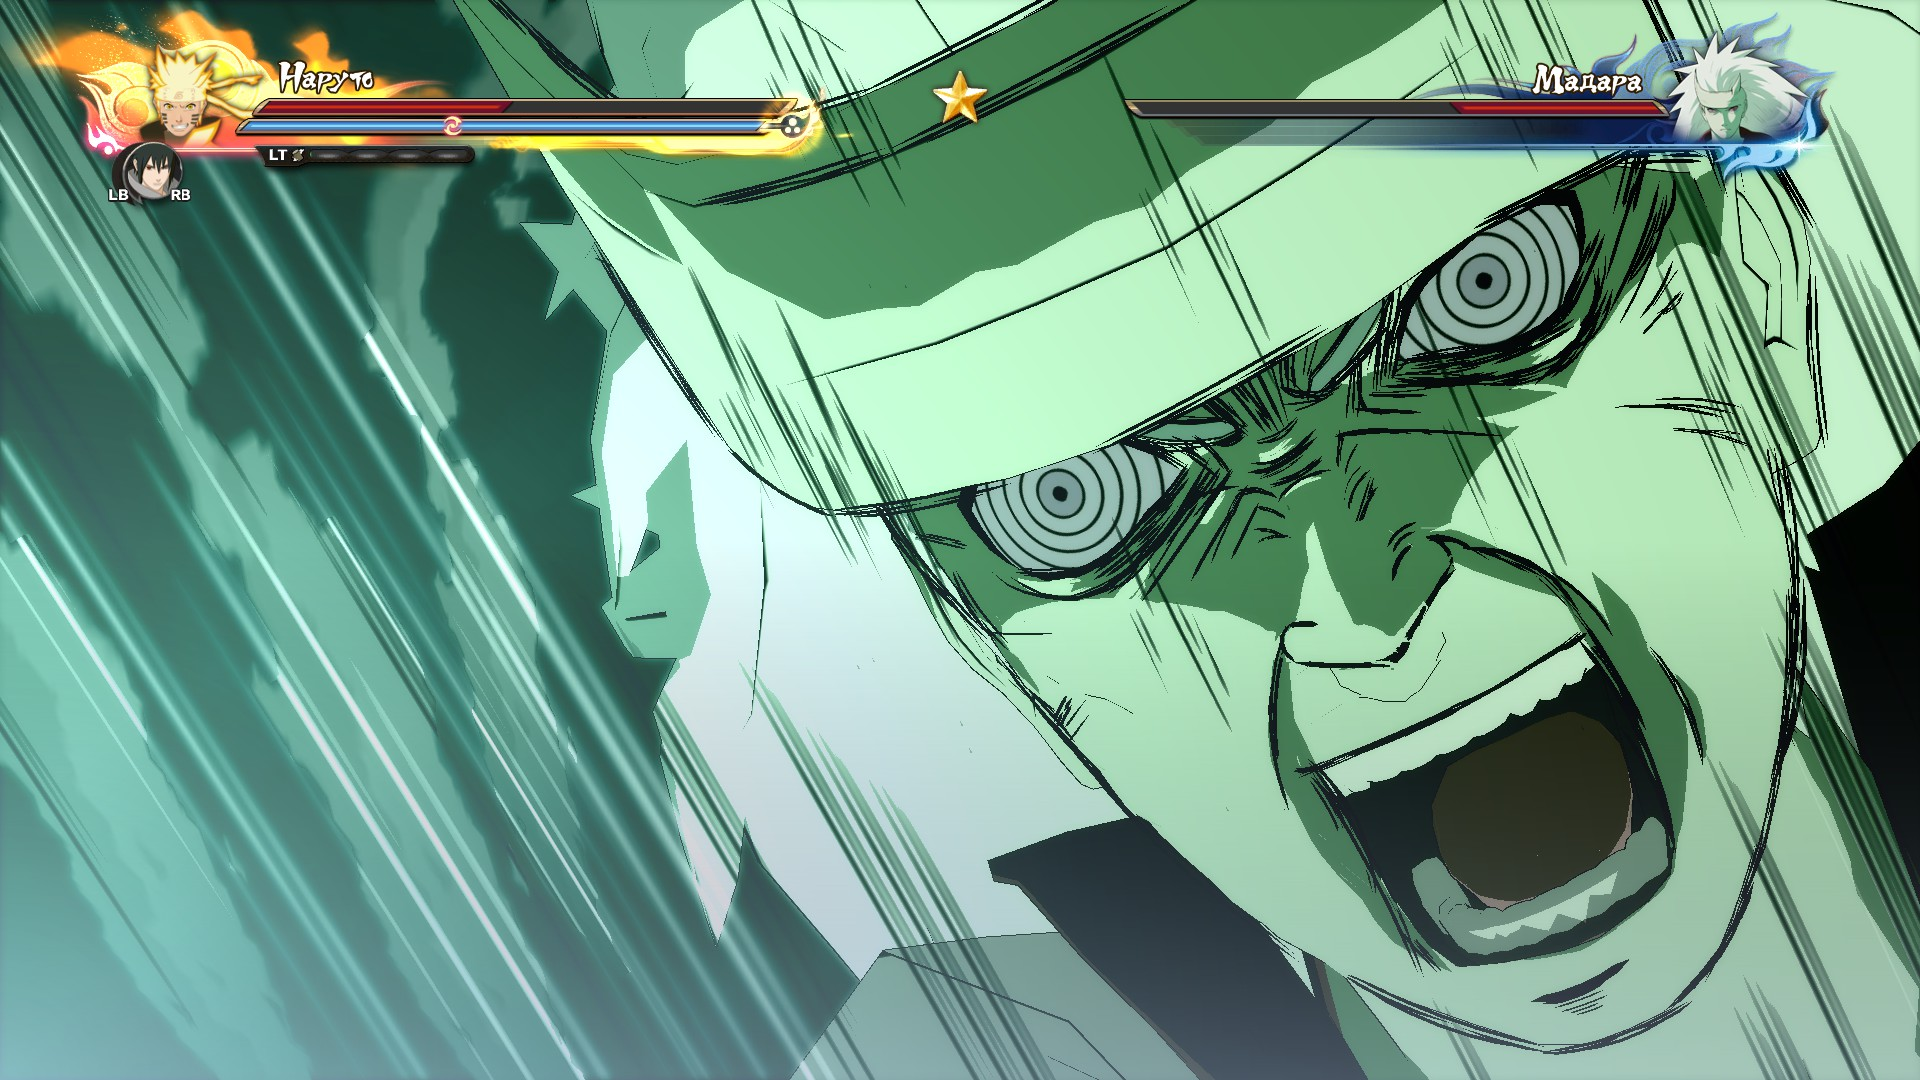 349040_screenshots_20180717202450_1.jpg - Naruto Shippuden: Ultimate Ninja Storm 4